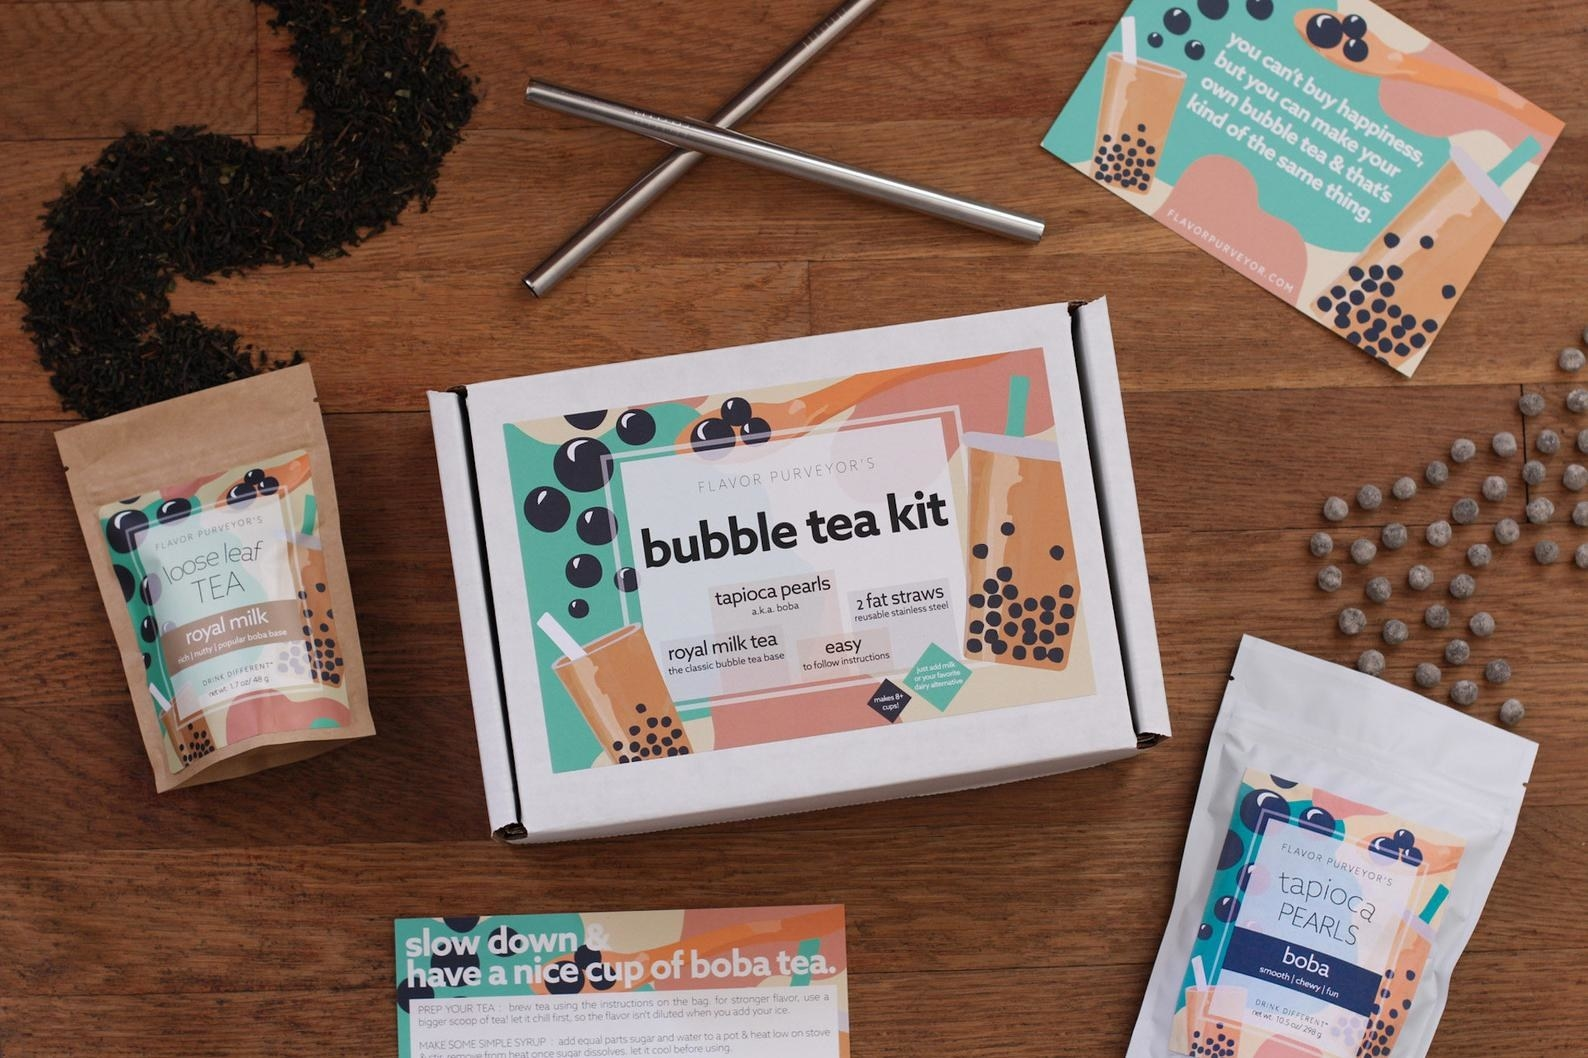 A small box kit